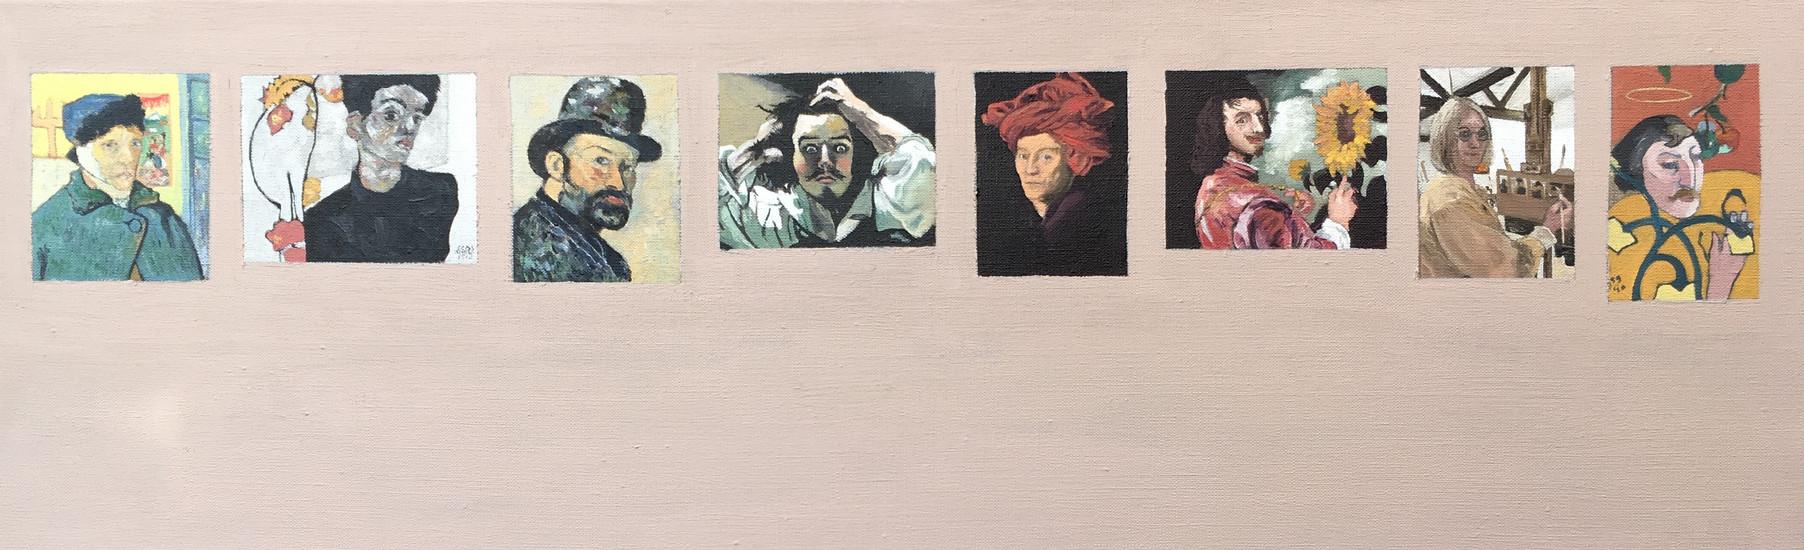 The Self-Portrait Exhibition Oil on canvas